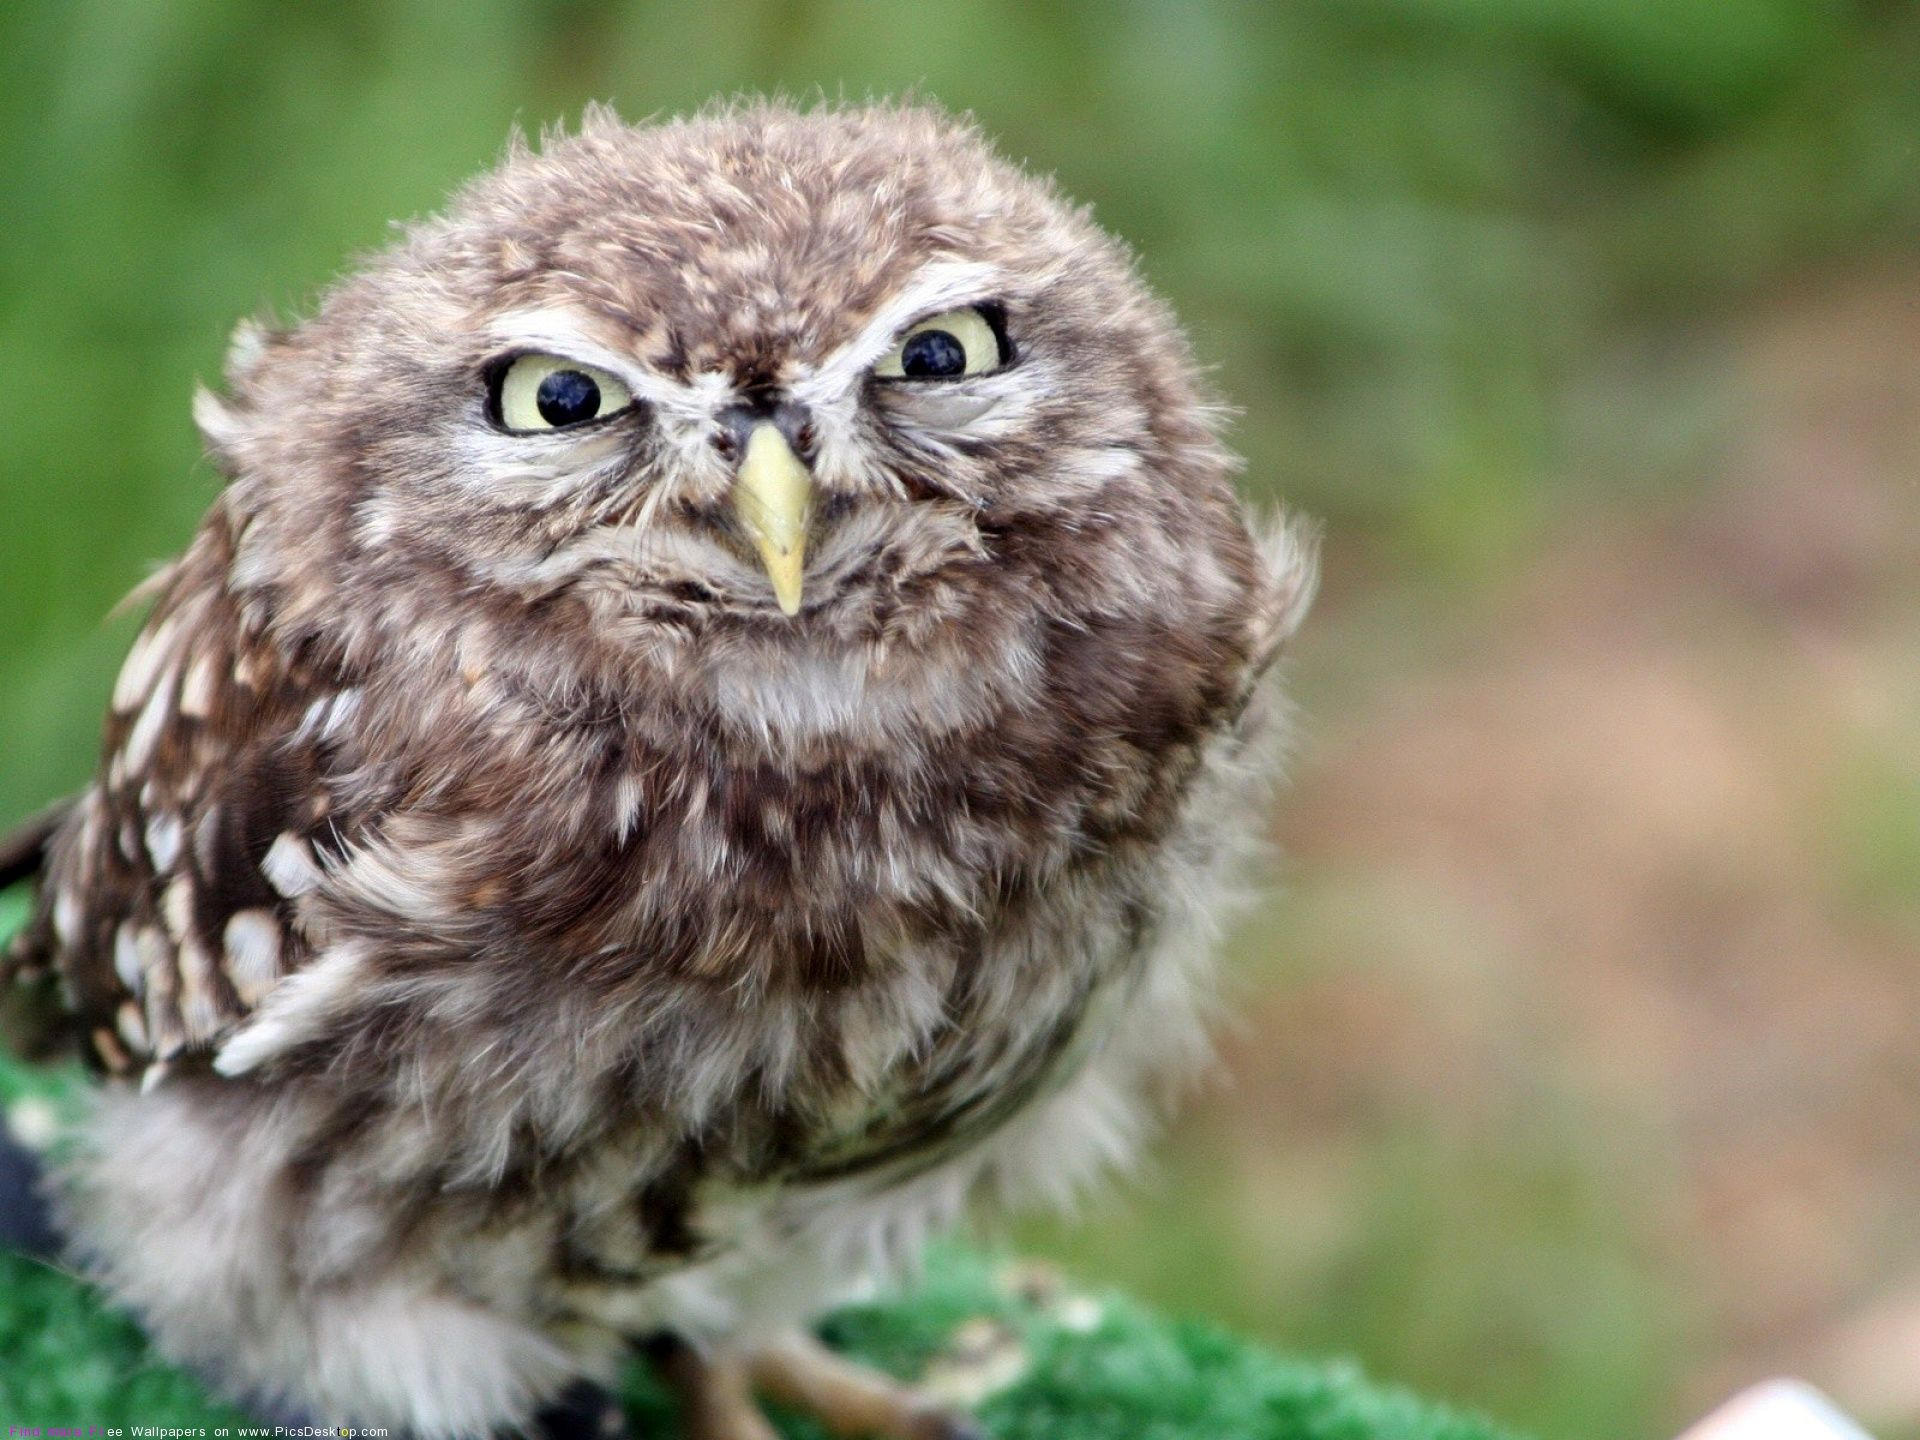 Angry owl (wallpaper). Lustige eulen, Ausgestopftes tier